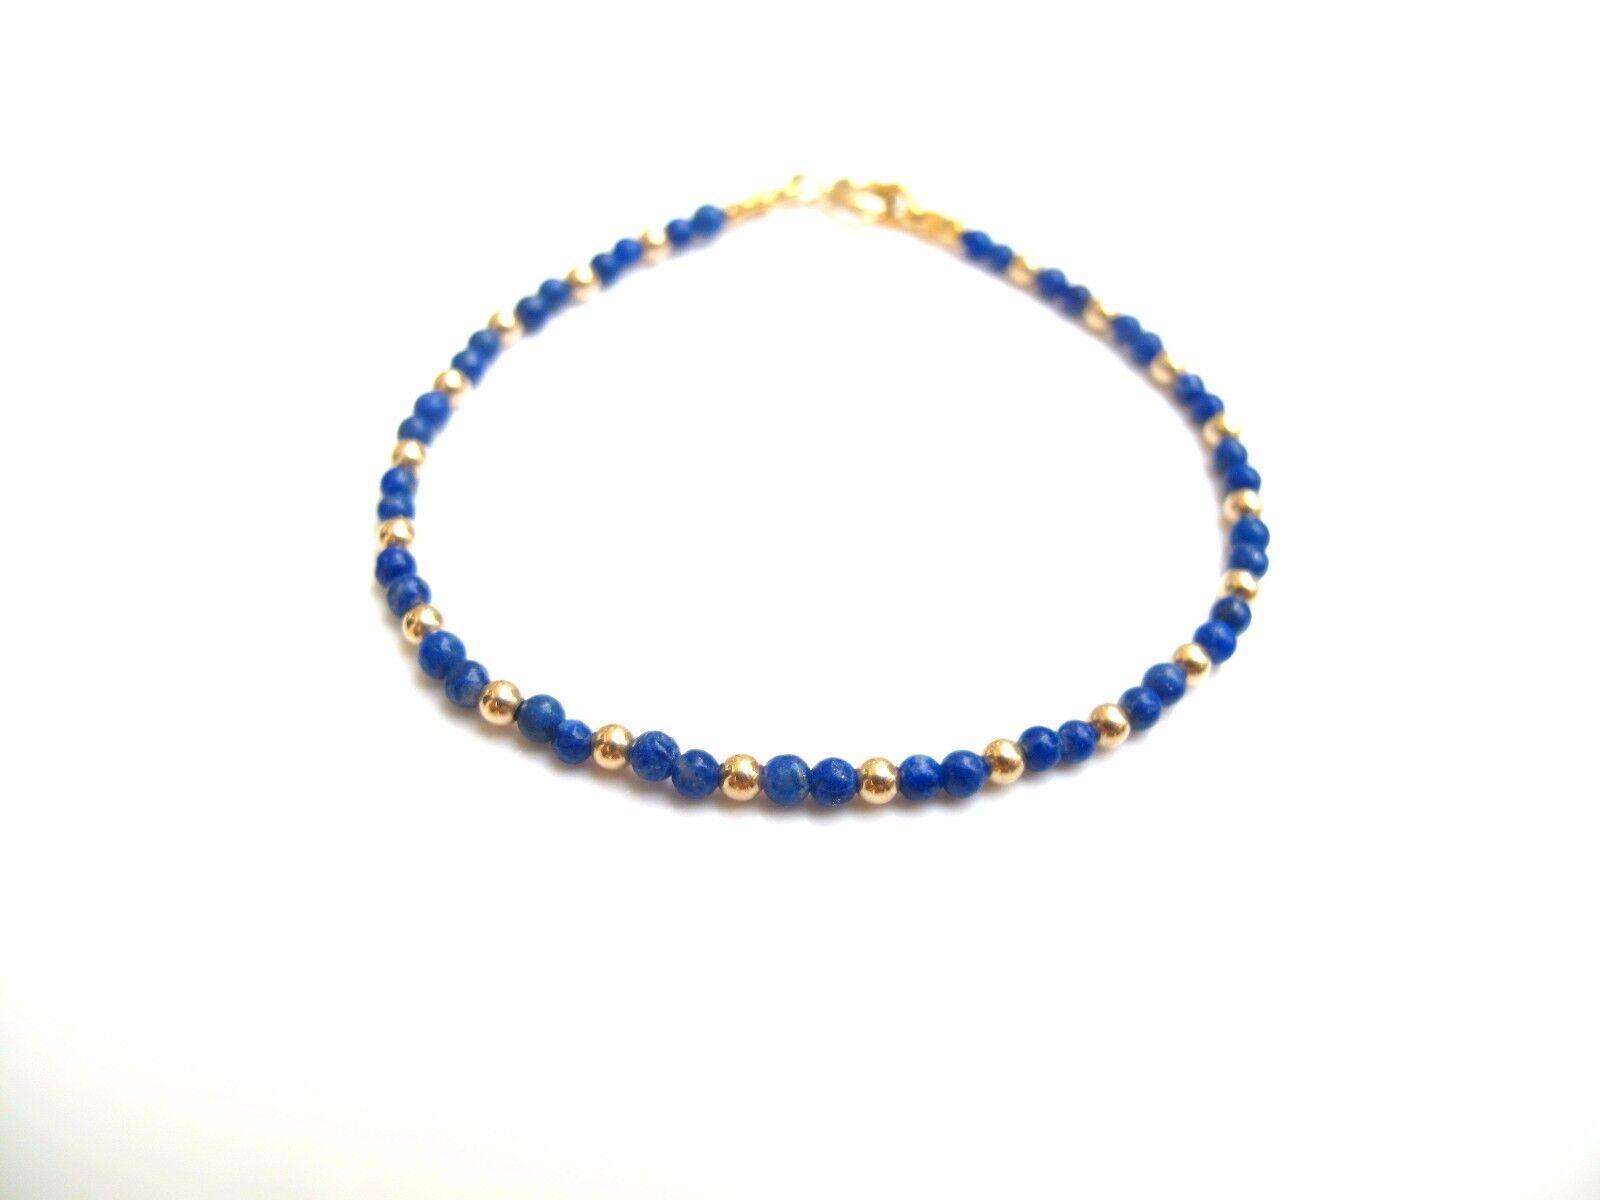 14 k gold beads bead yellow bluee lapis gem natural bracelet genuine small lbluei